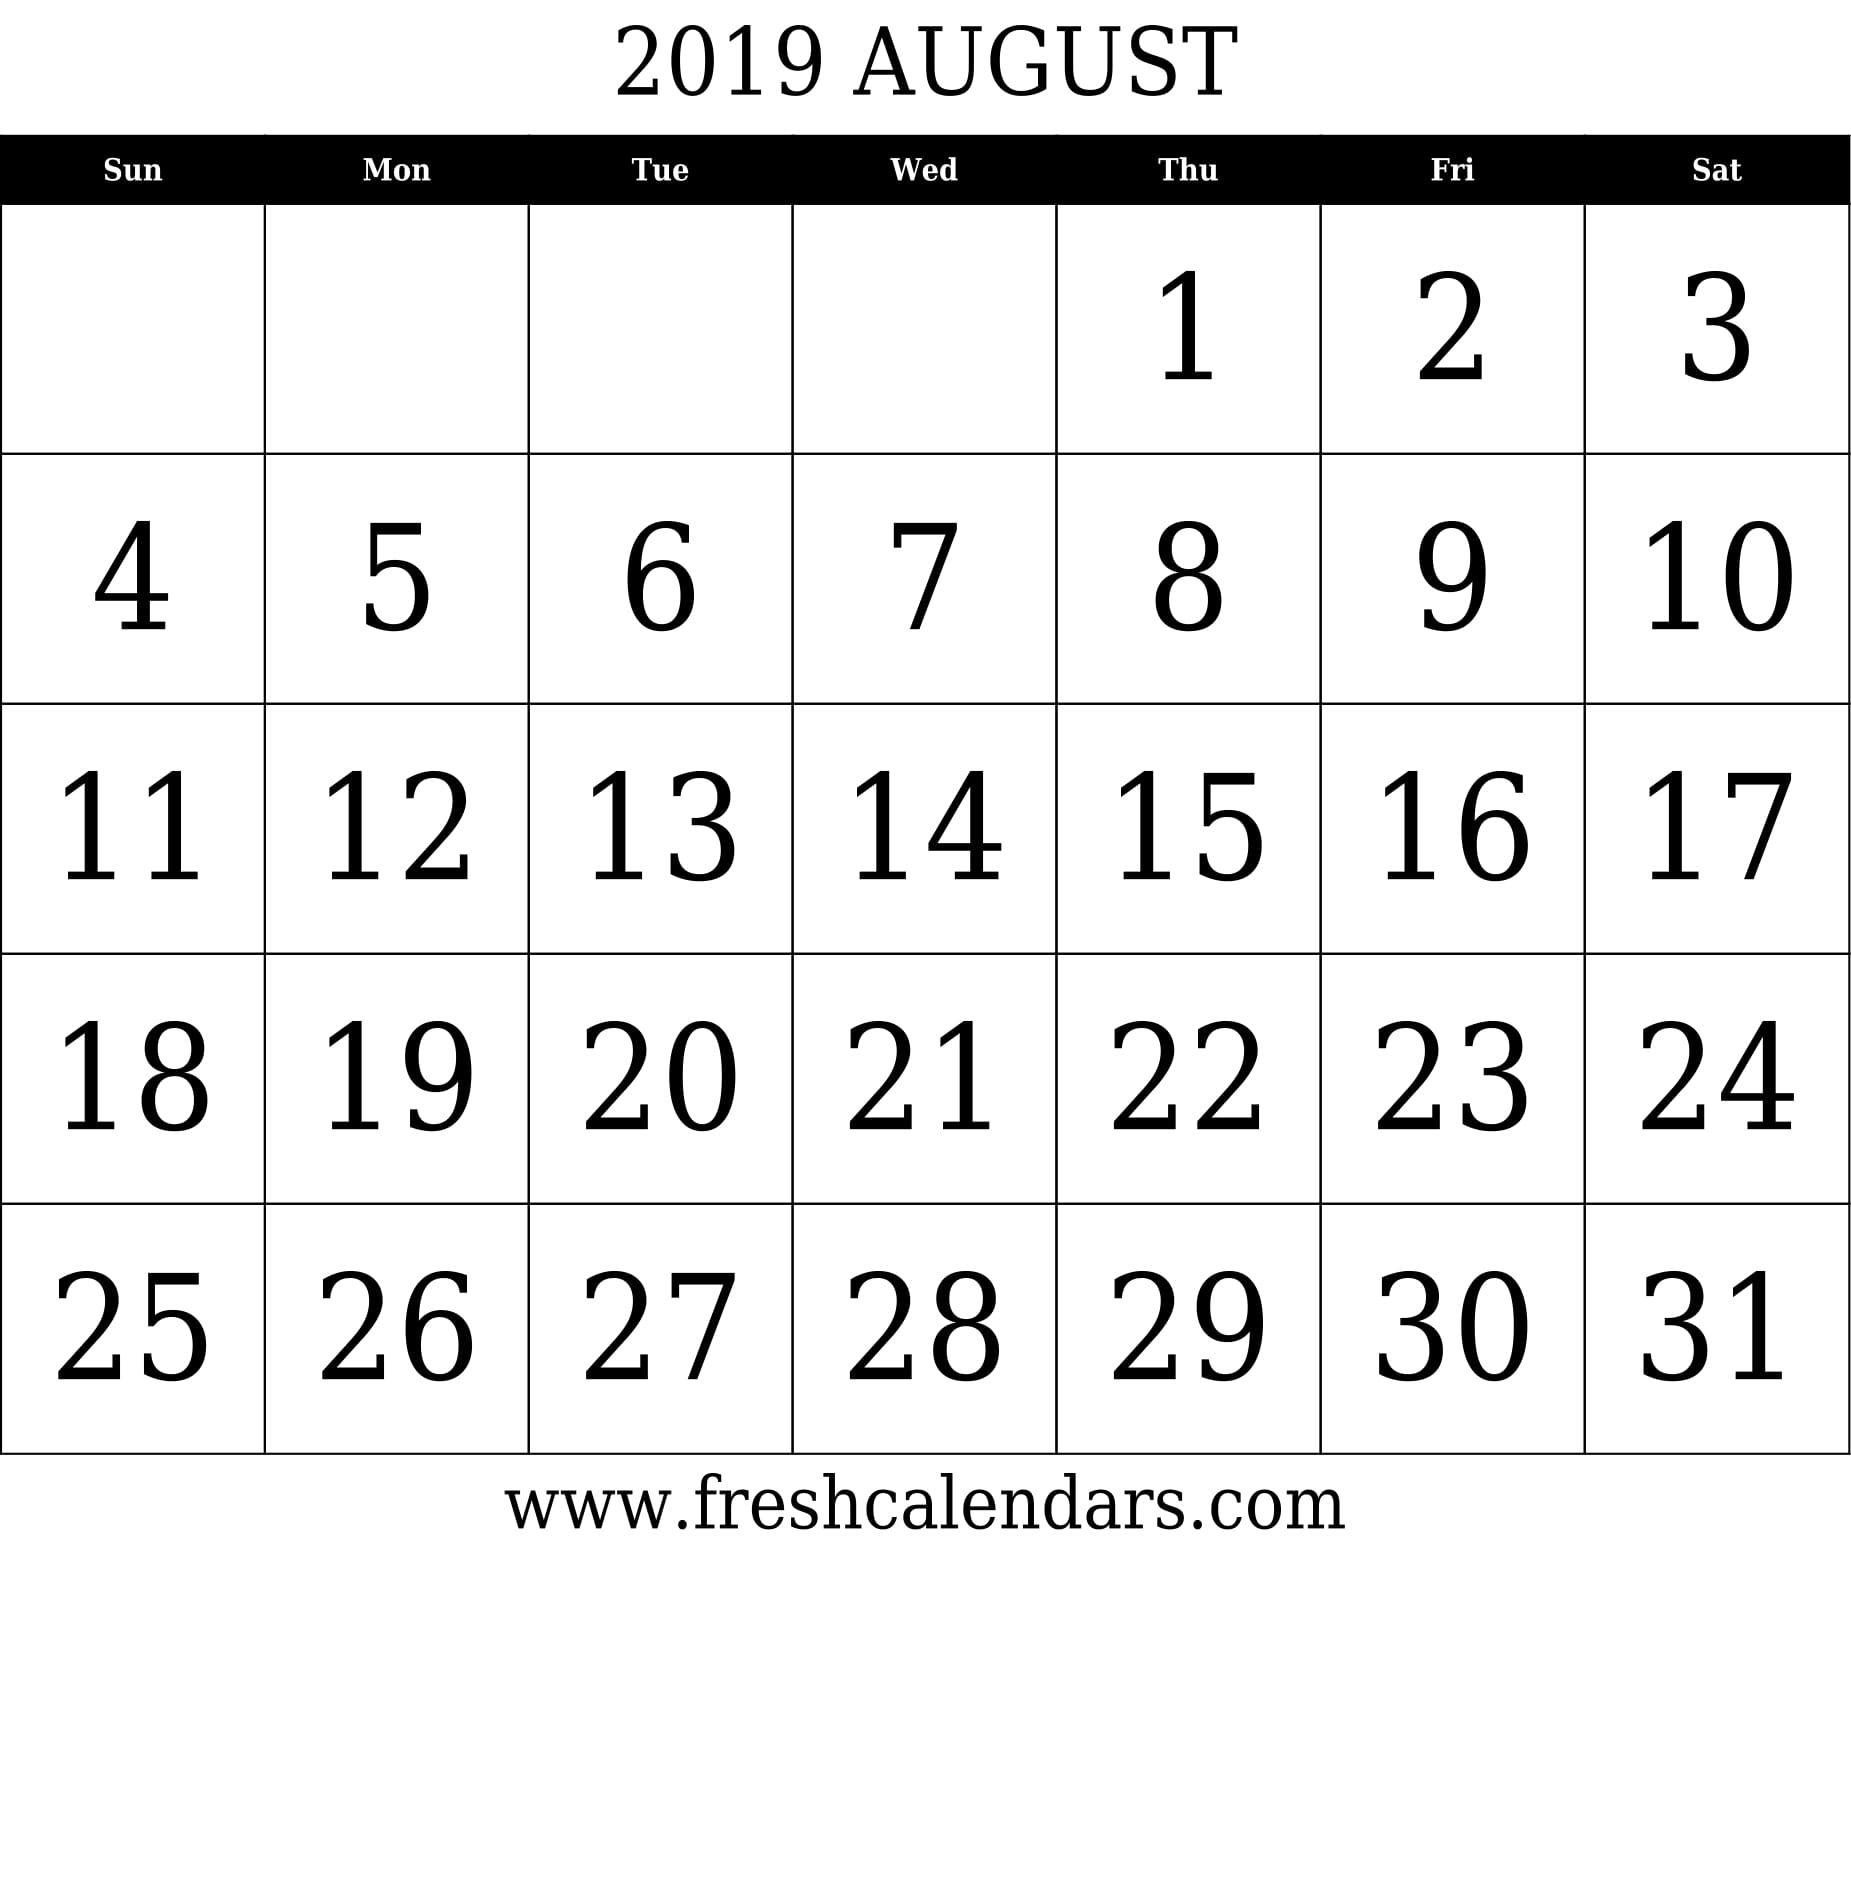 August 2019 Calendar Printable Templates Make It Calendar Printables Calendar 2019 Template August Calendar